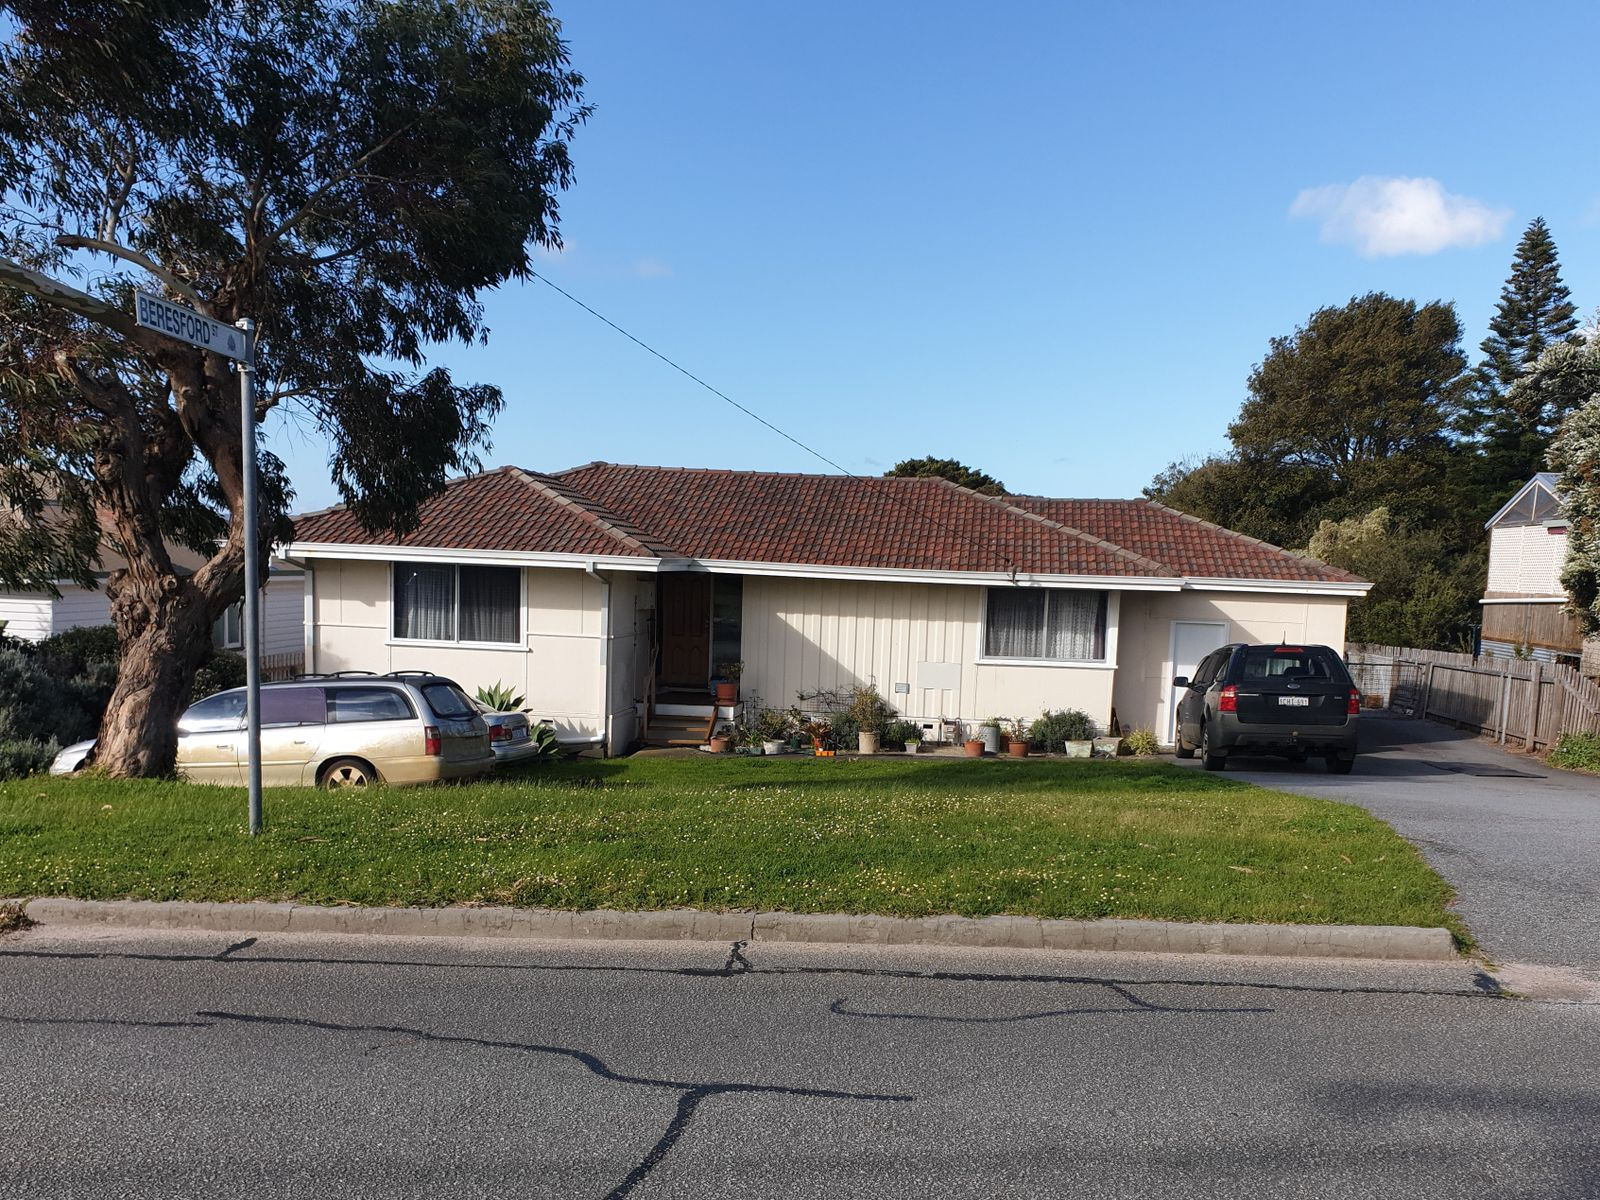 70 Seymour Street, Mira Mar, WA 6330